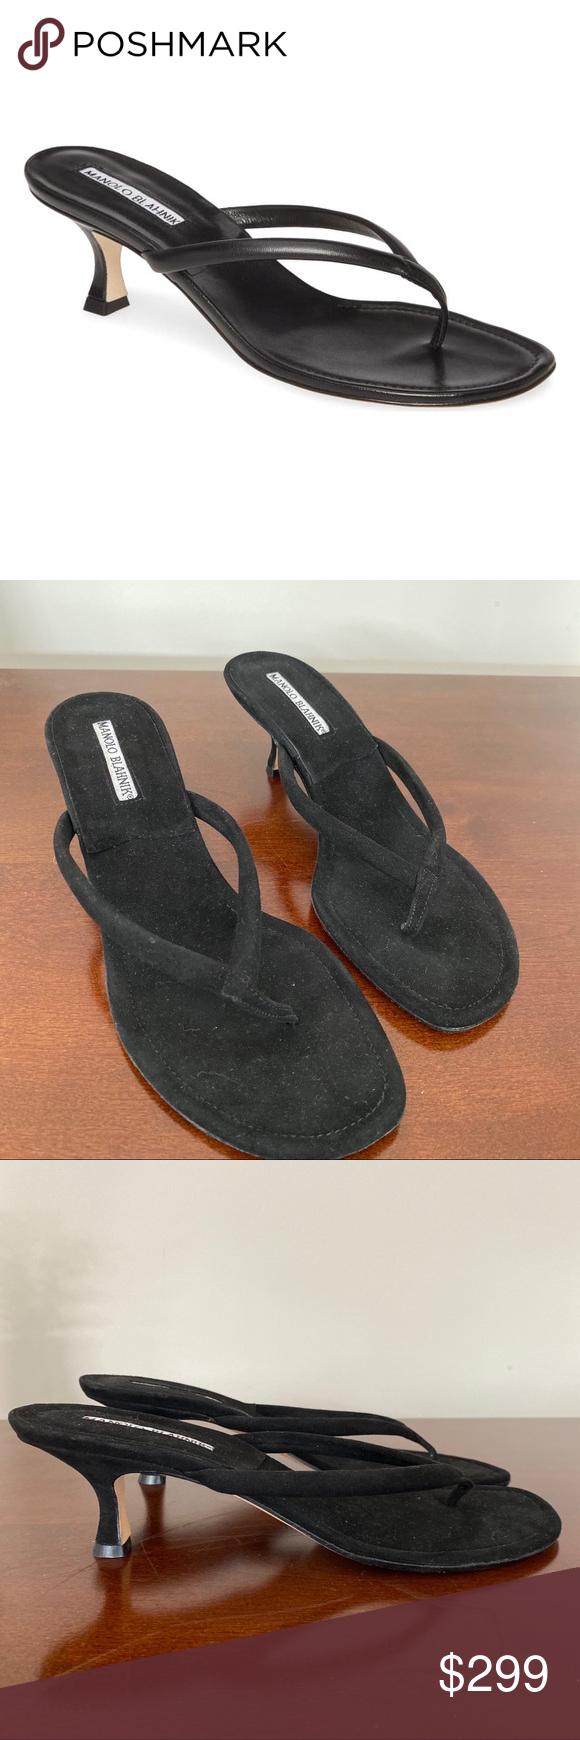 Manolo Blahnik Black paterno kitten heels 38.5 Manolo Blahnik Black paterno kitt…